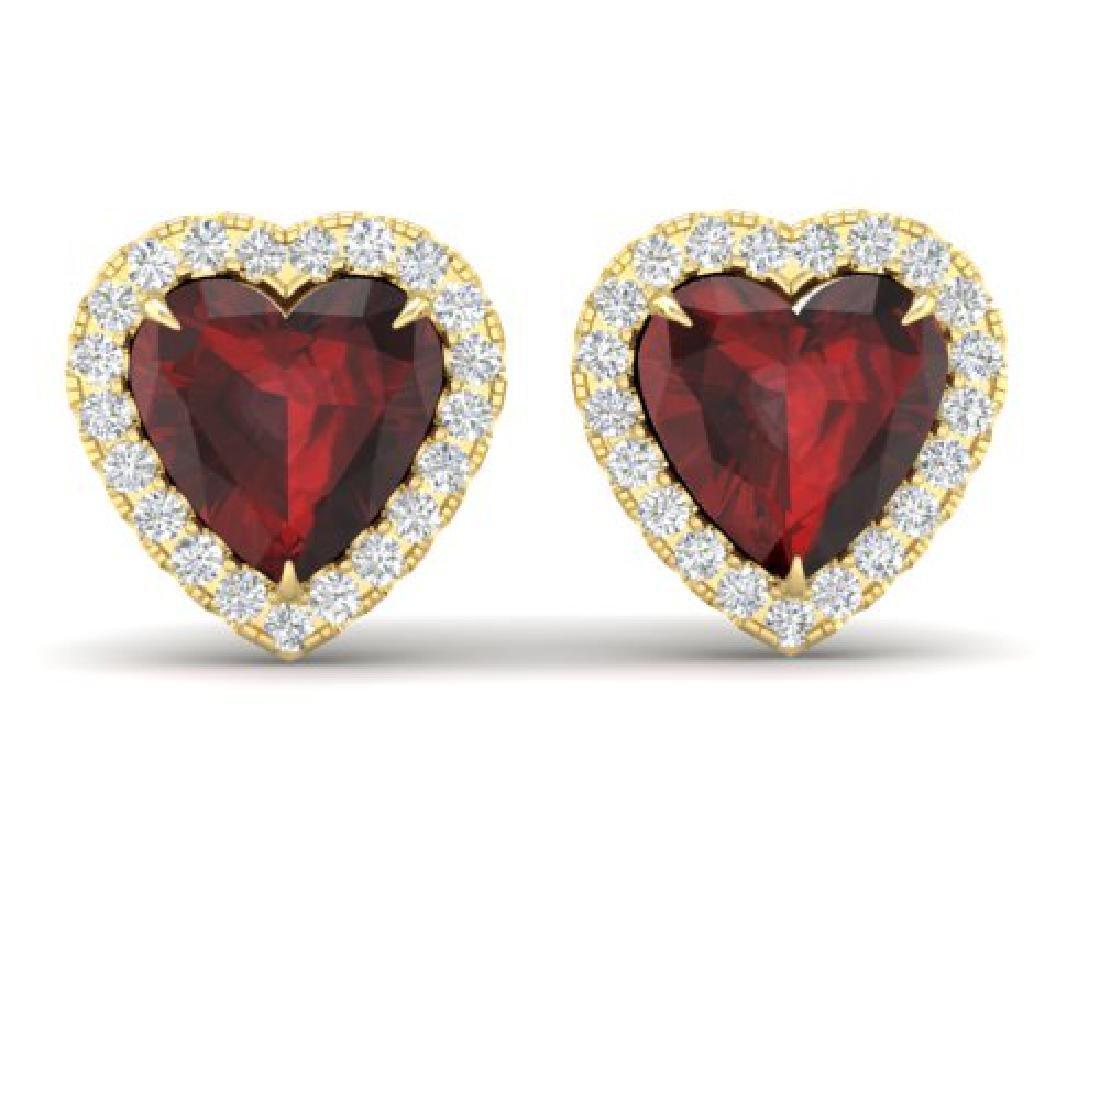 2.22 CTW Garnet & Micro Pave VS/SI Diamond Earrings